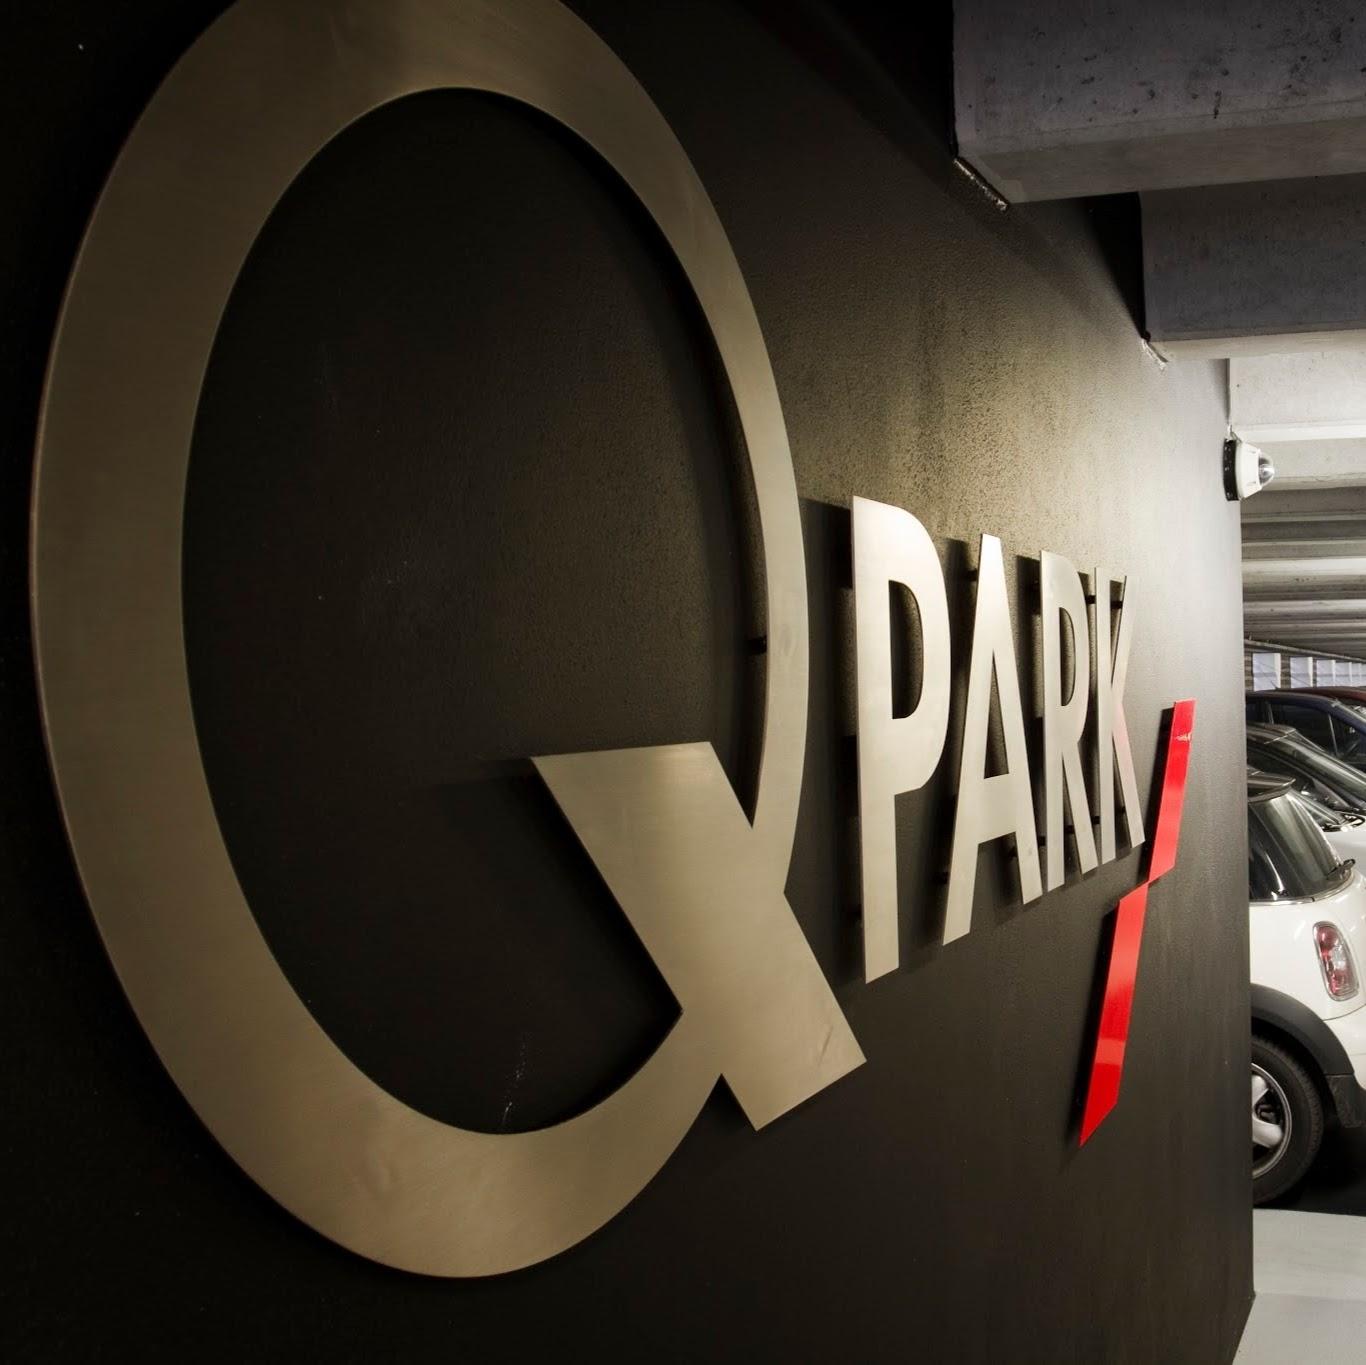 Q Park Ceramique Maastricht accepteert American Express Credit Cards